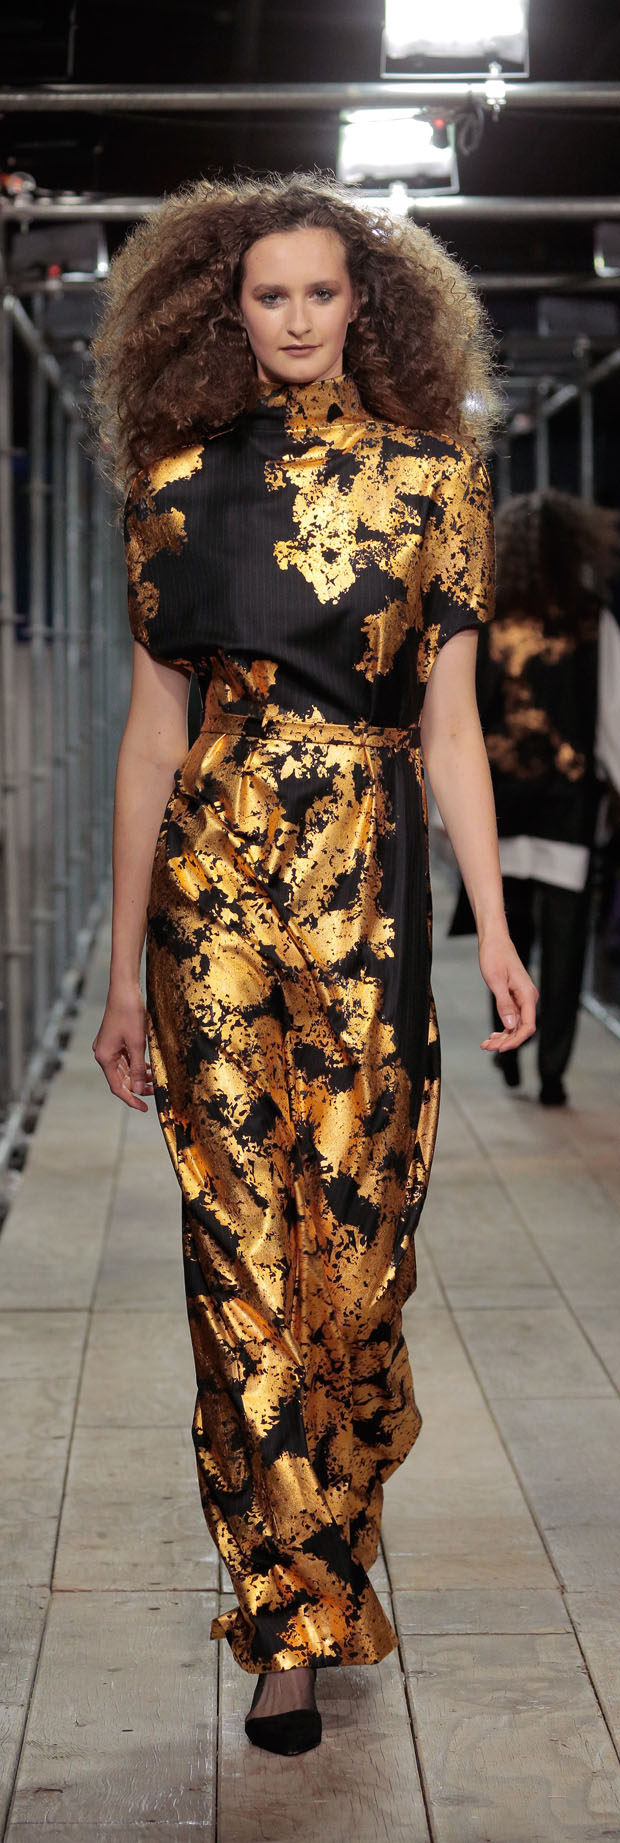 63_Denise Ramos, fashion design and Jorge Iglesias, textile design_CROPPED.jpg